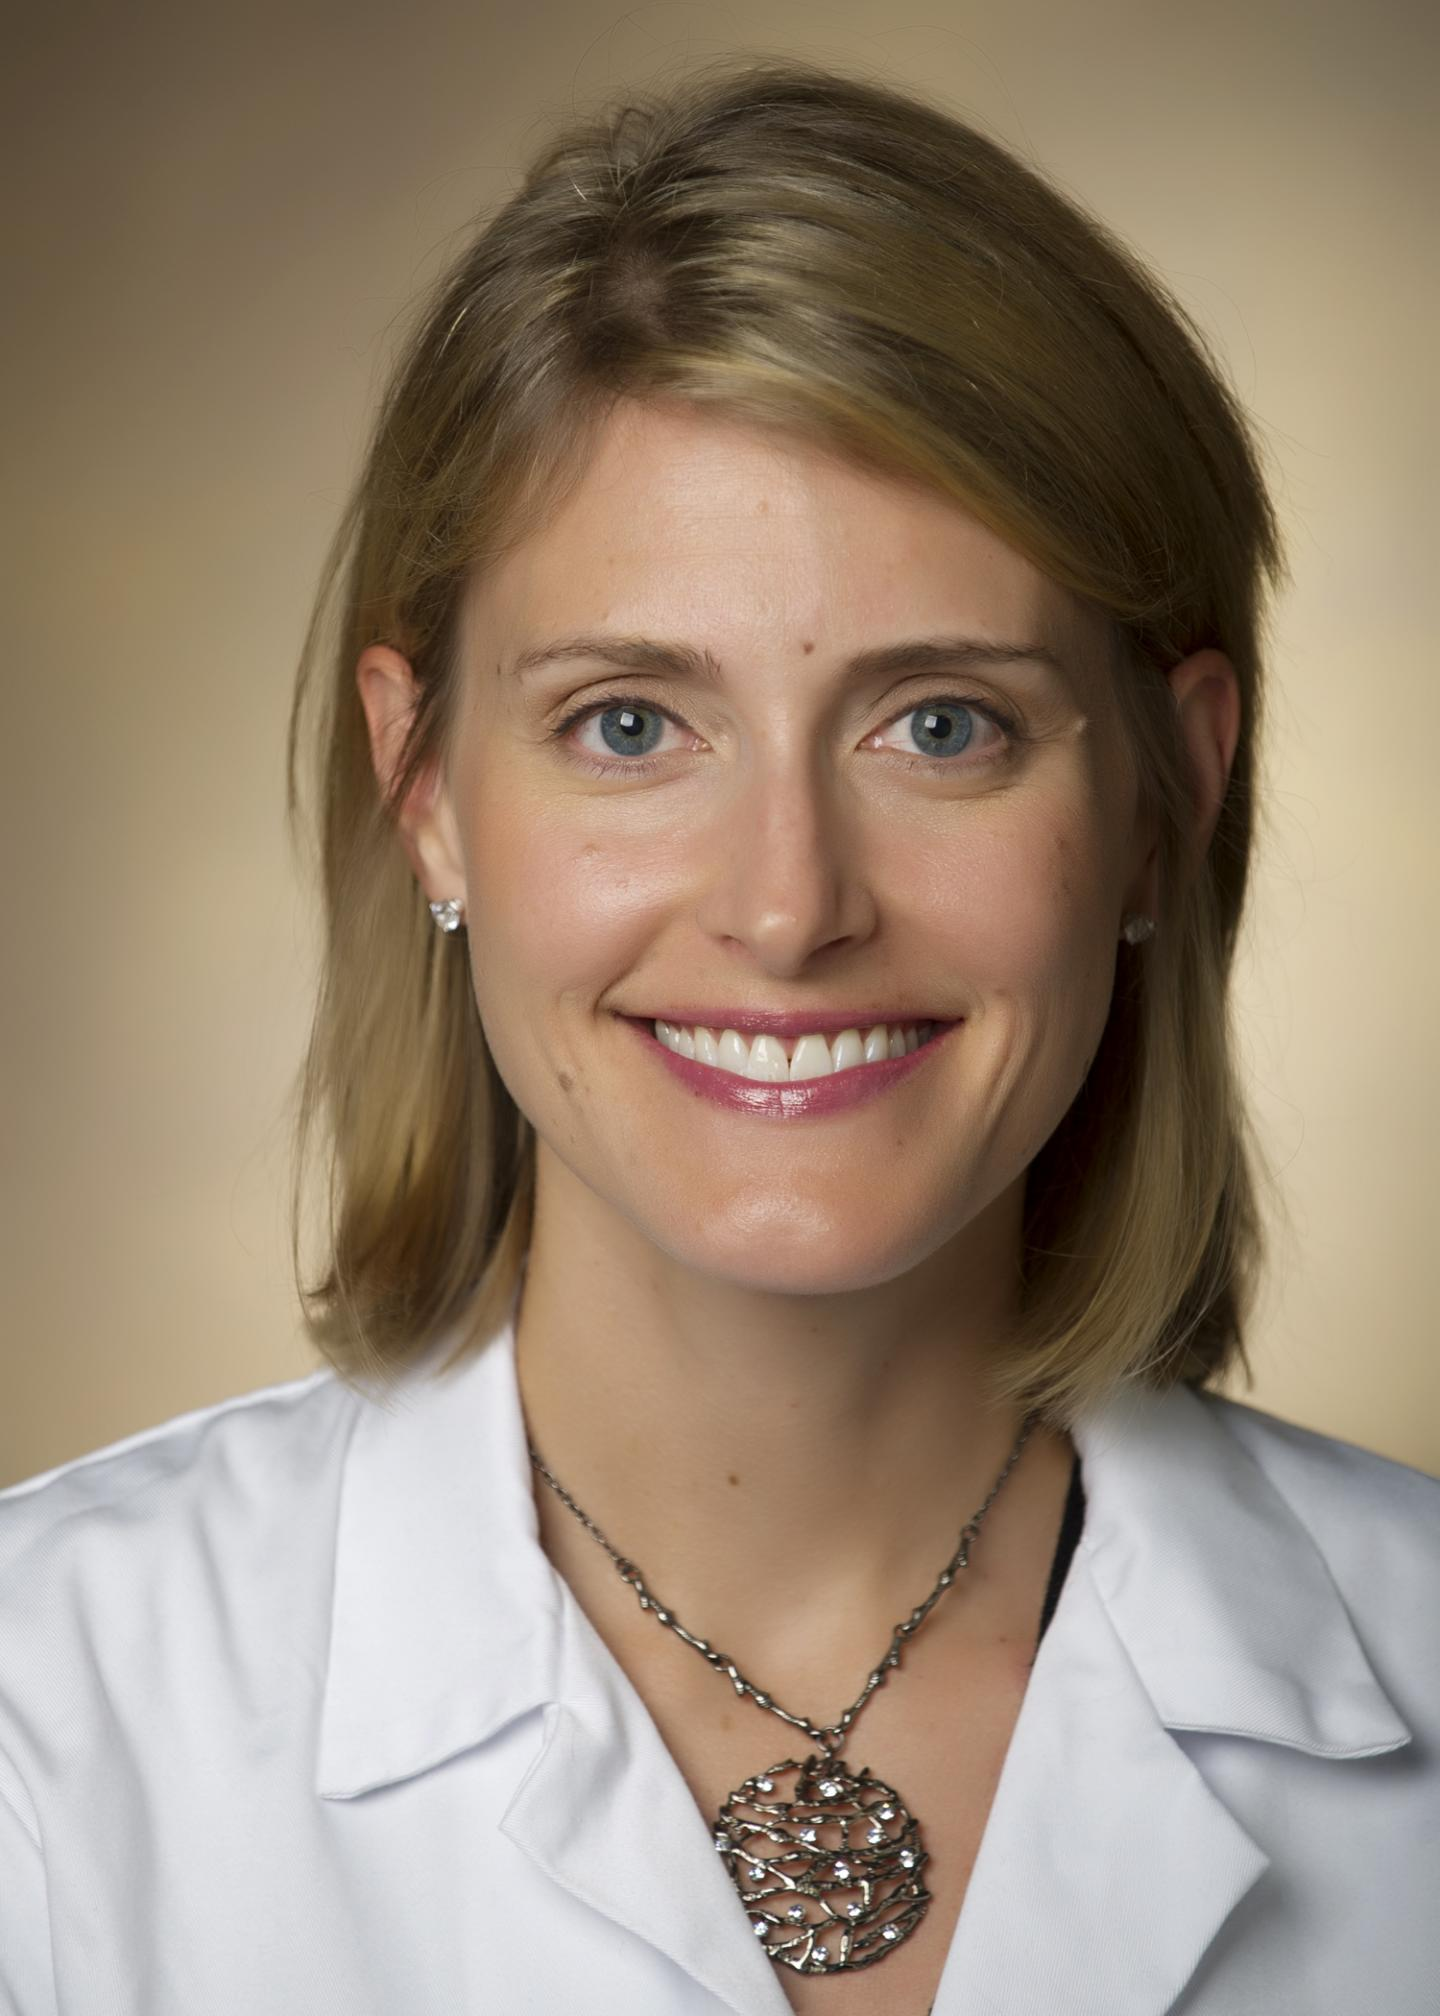 Dr. Kelly Schlendorf, Vanderbilt University Medical Center